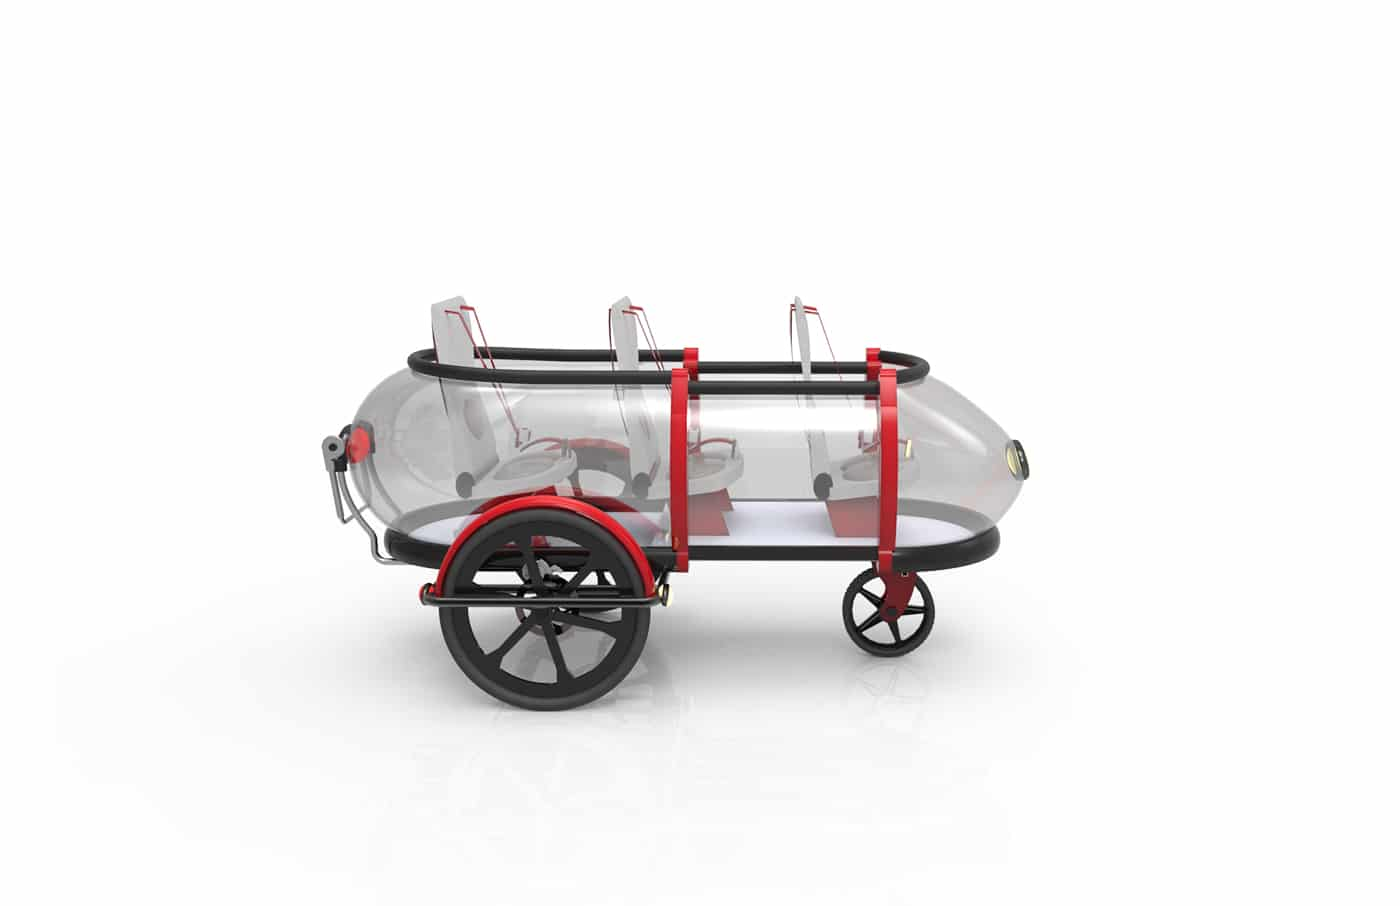 SideBuddy-by-Jordi-Hans-Design-Bycycle-Trailer,-Cargo-Bike,-Side-Trailer,-Kid-Bike-trailer,-by-Jonkoping-Sweden-Design-Consuting-3